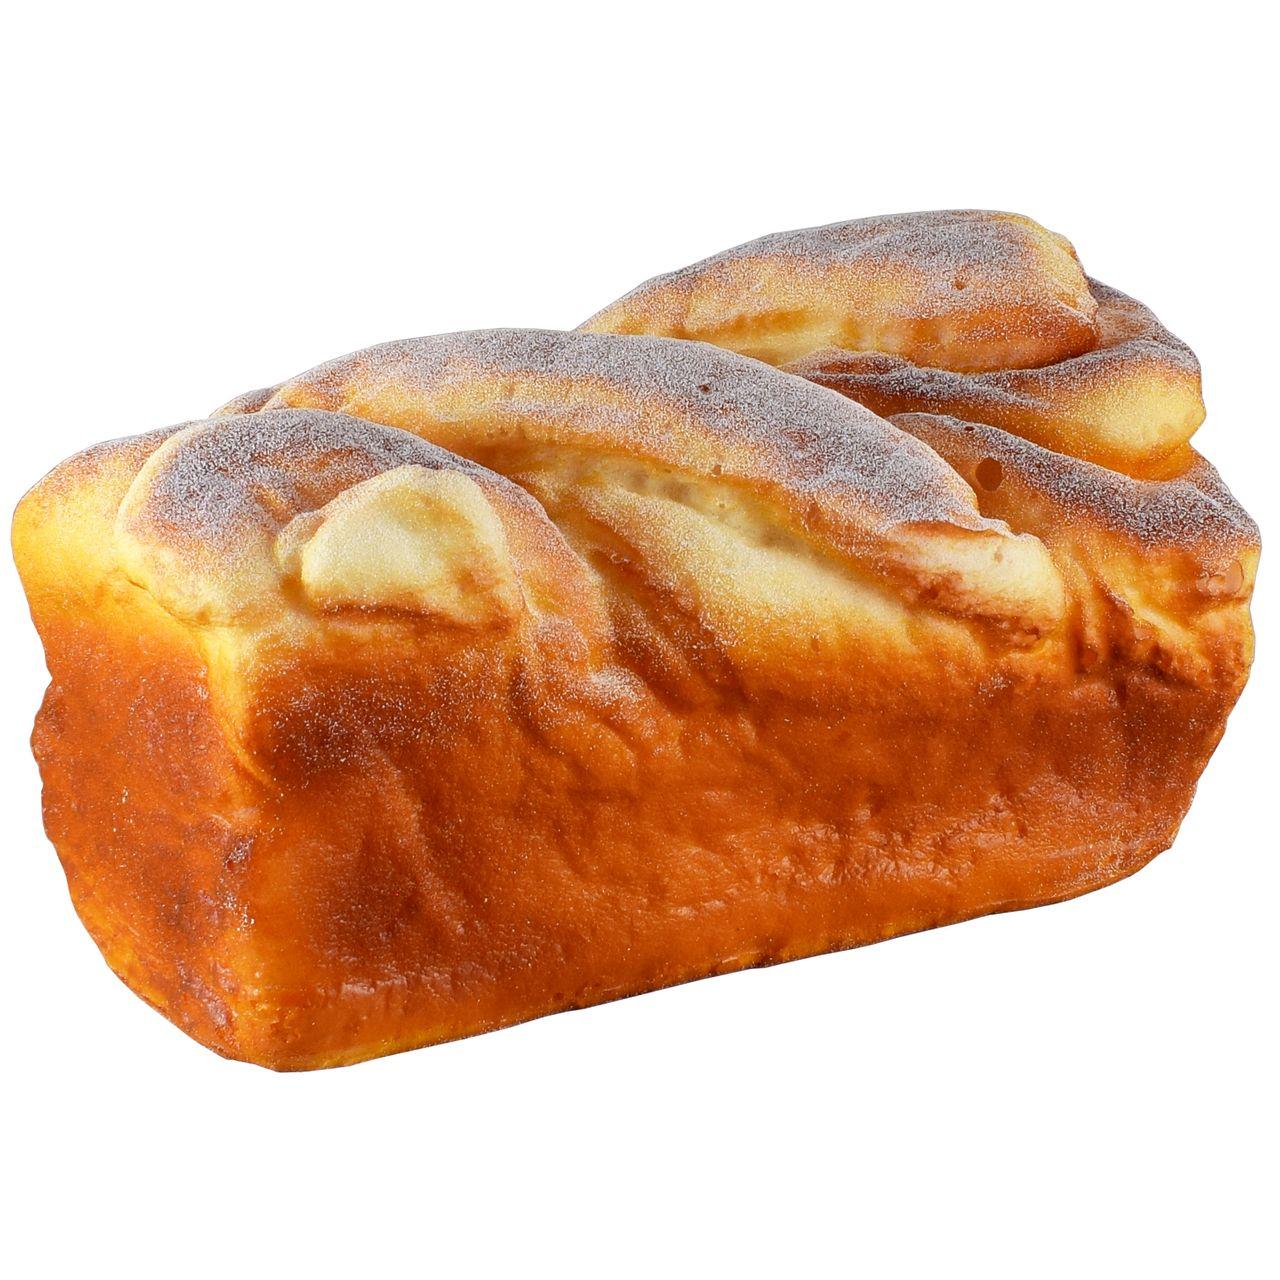 مگنت طرح نان کد 8899